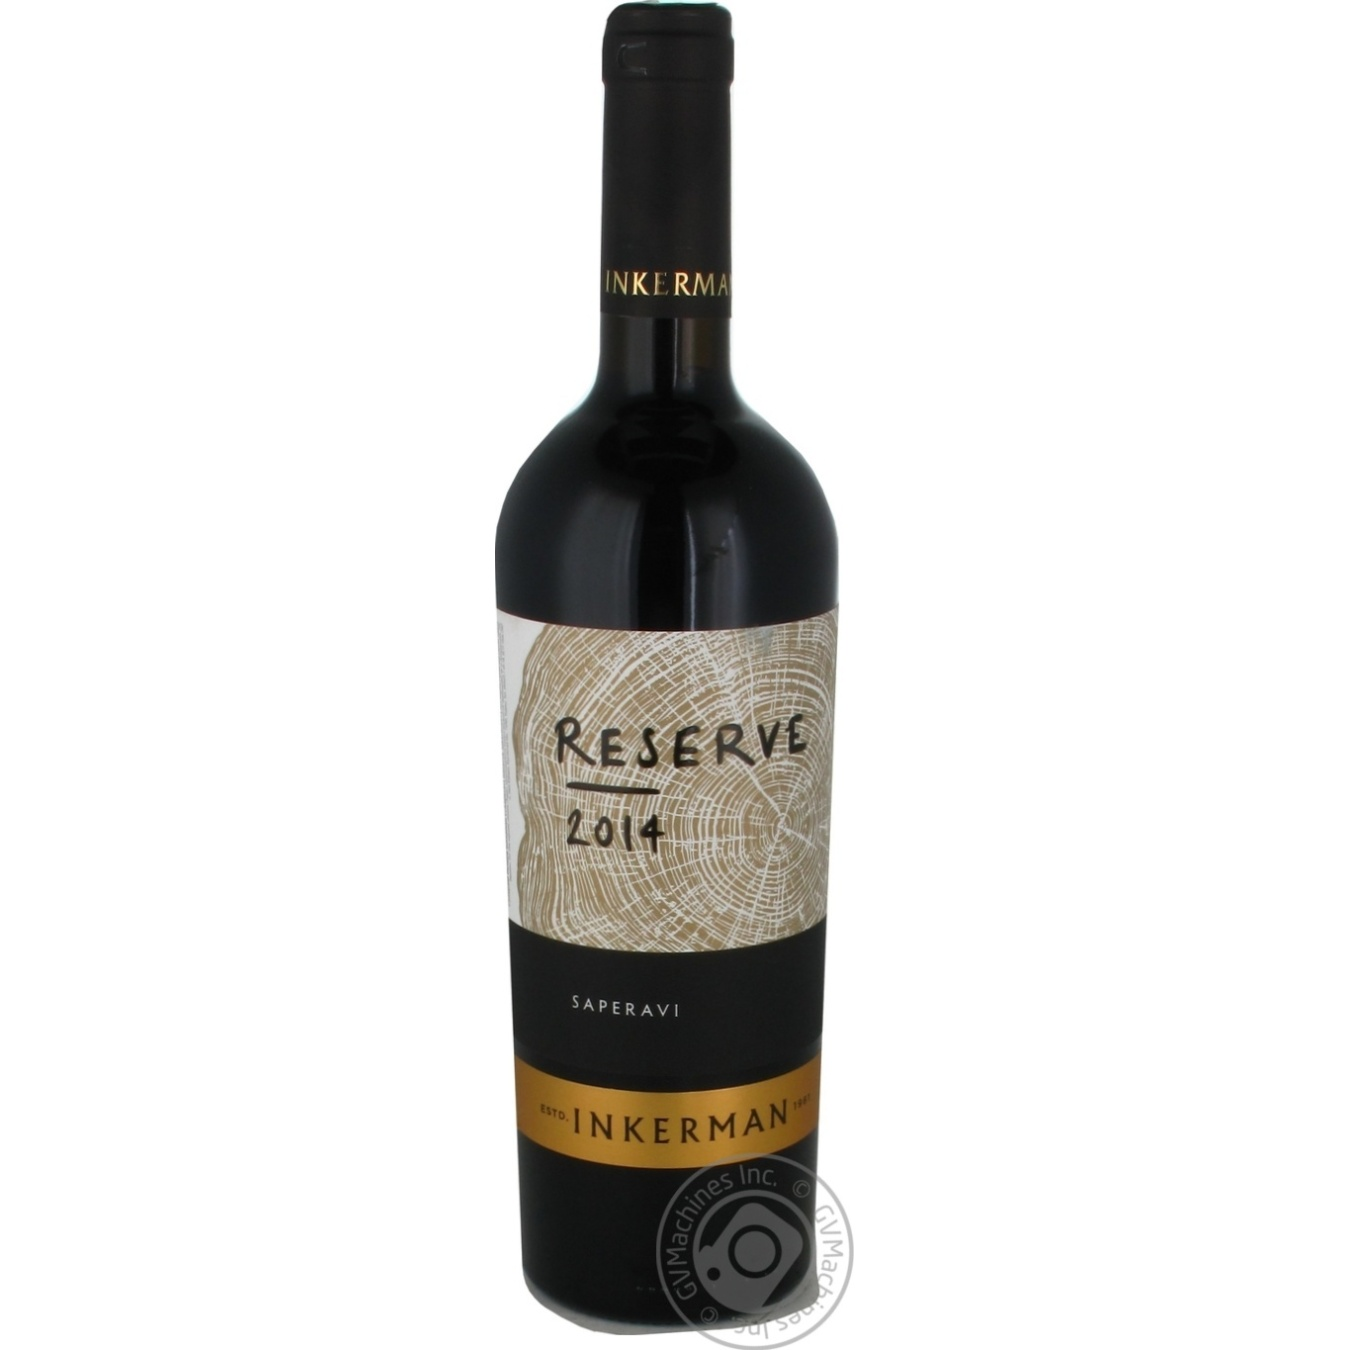 Купить Алкоголь та енергетики, Вино Inkerman Reserve Сапераві червоне сухе 10-14% 0, 75л